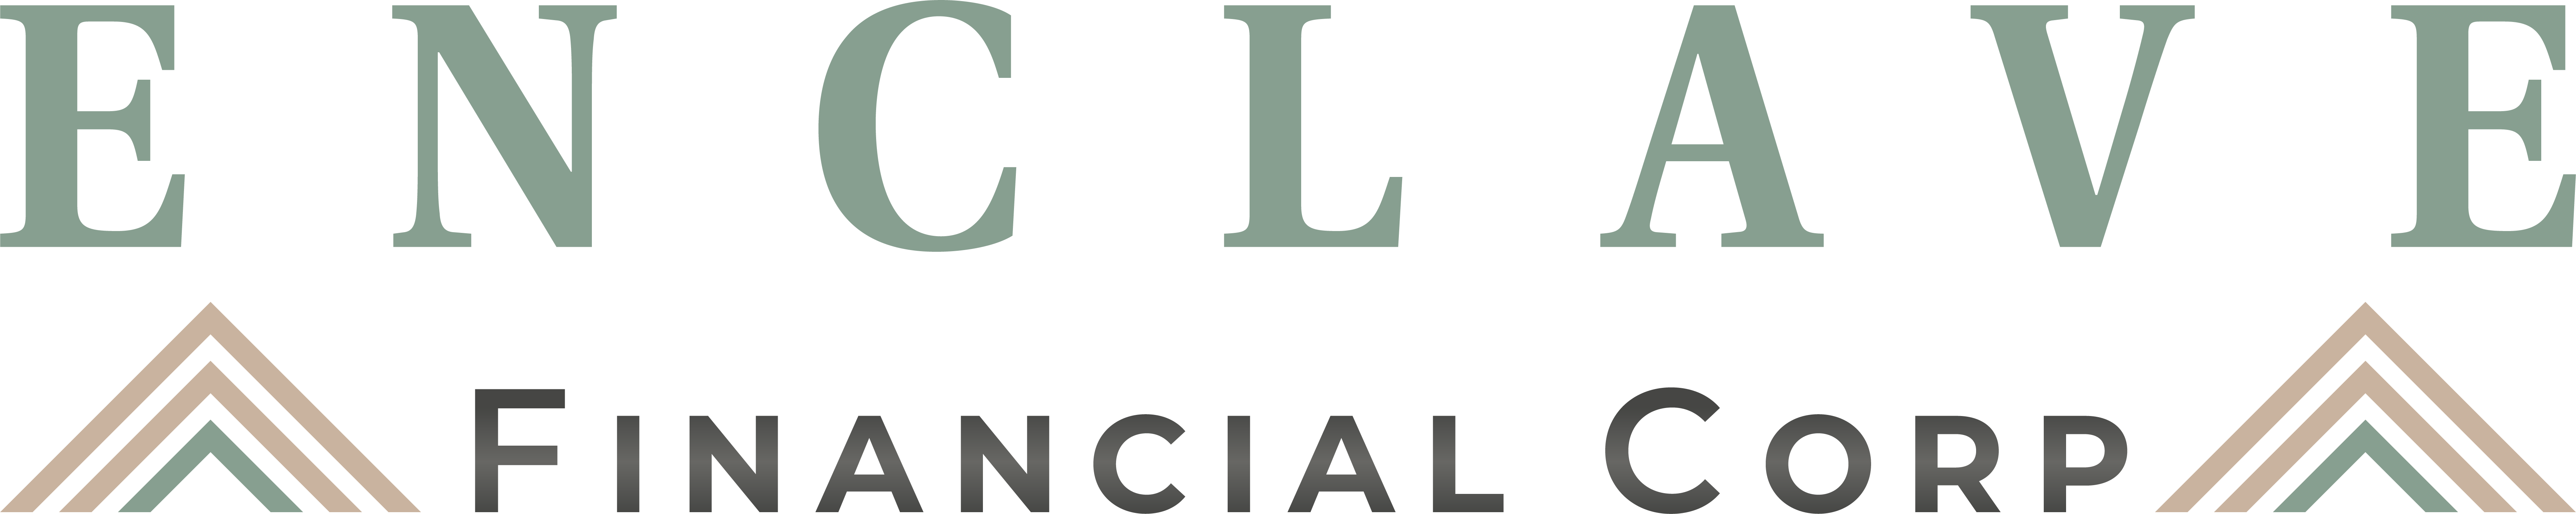 Enclave Financial Corp